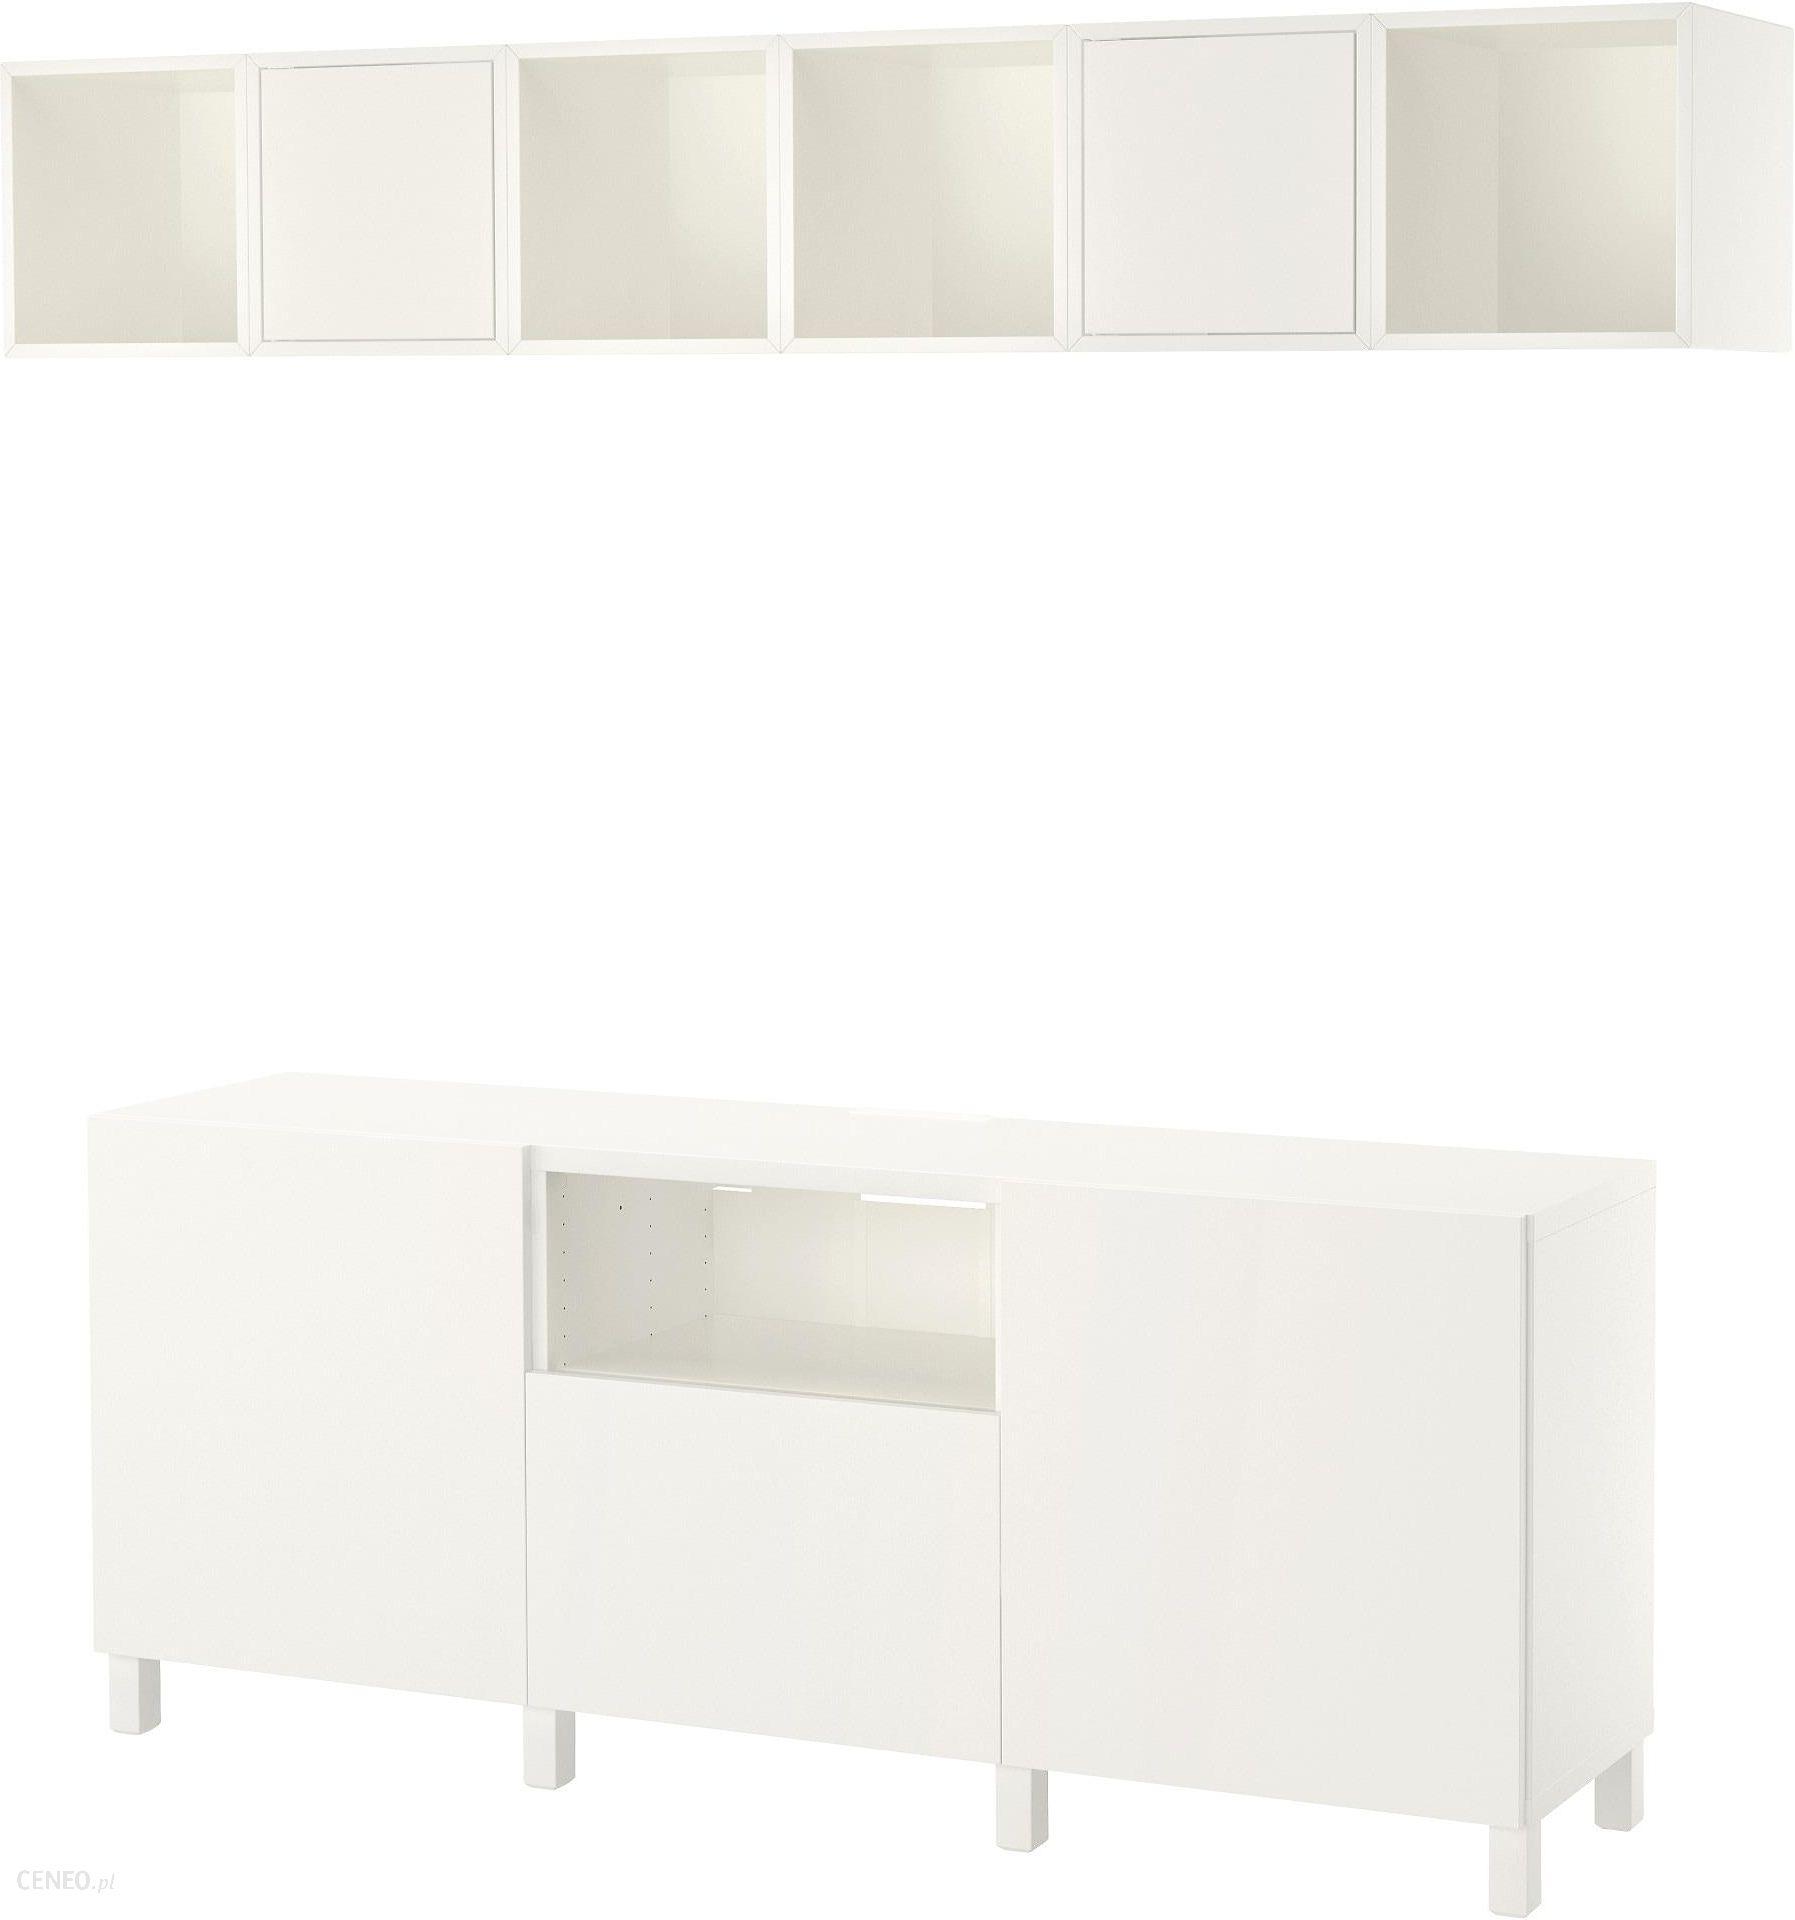 Ikea Besta Eket Kombinacja Szafek Pod Tv S09221158